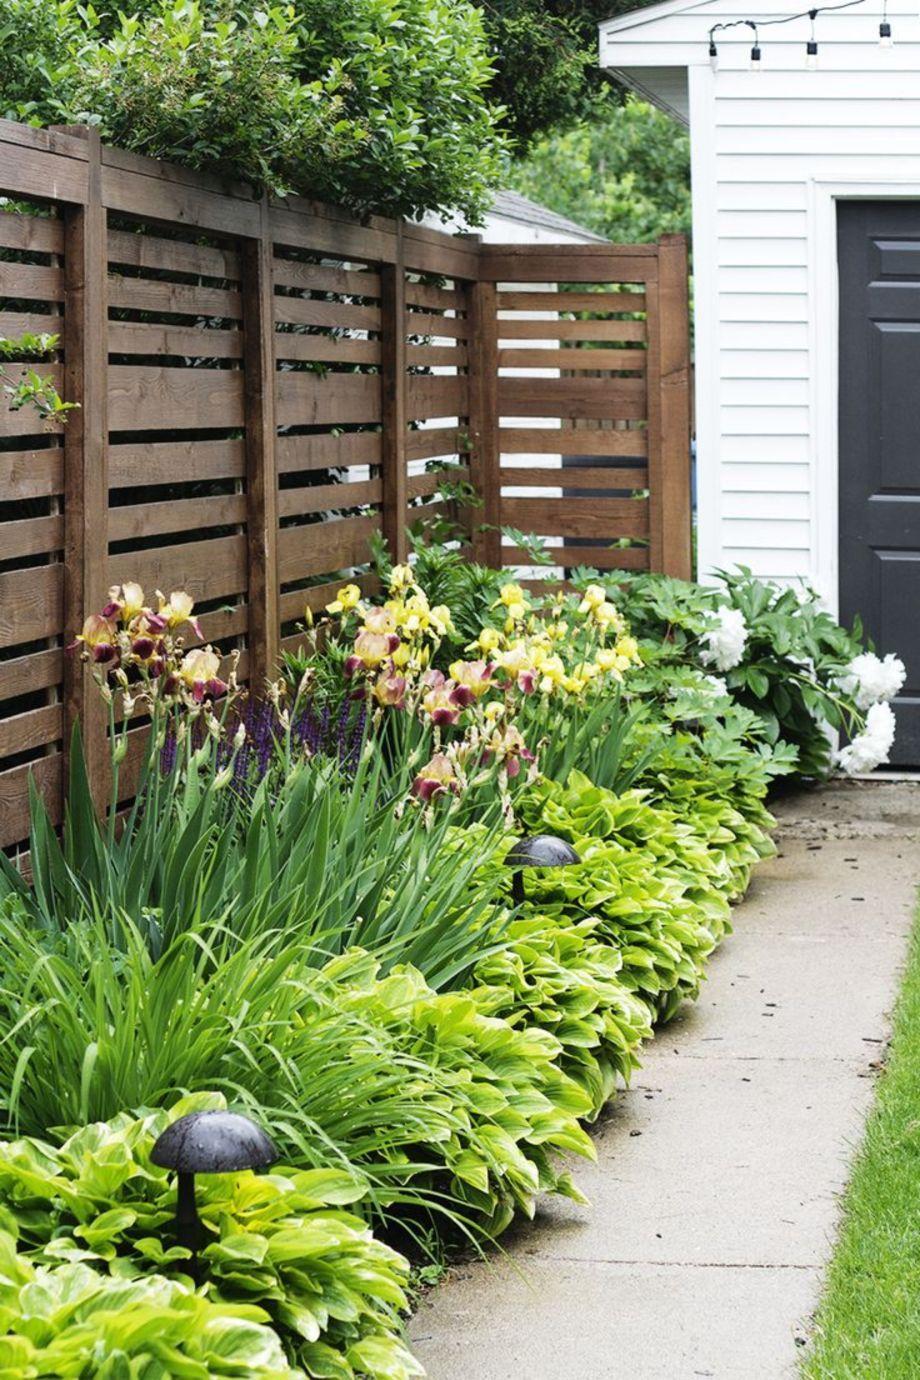 stunning fence ideas for back yard and front yard 30 on backyard garden fence decor ideas id=44729